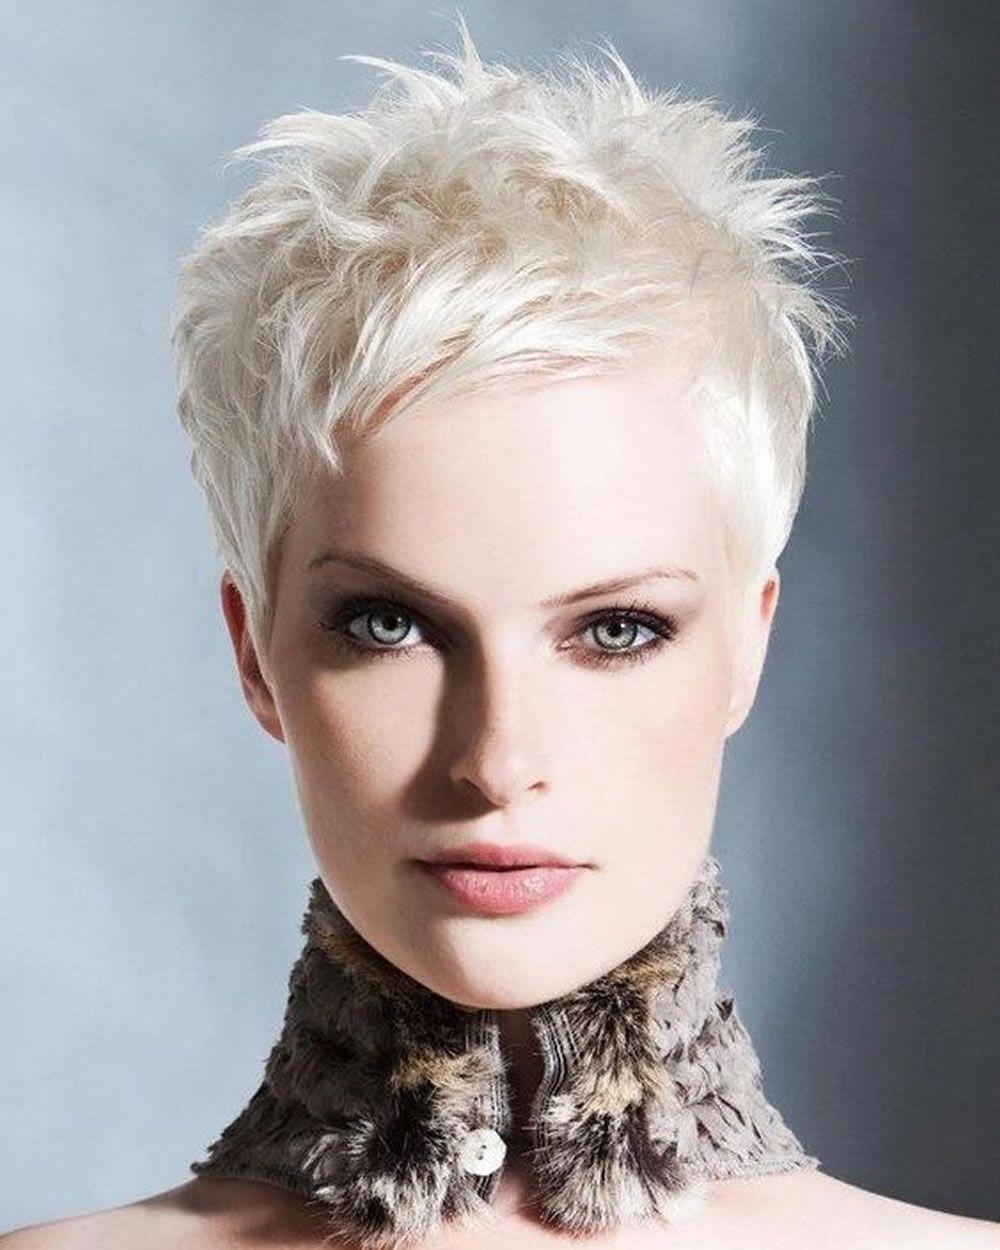 Super Very Short Pixie Haircuts & Short Hair Colors 2018 ...